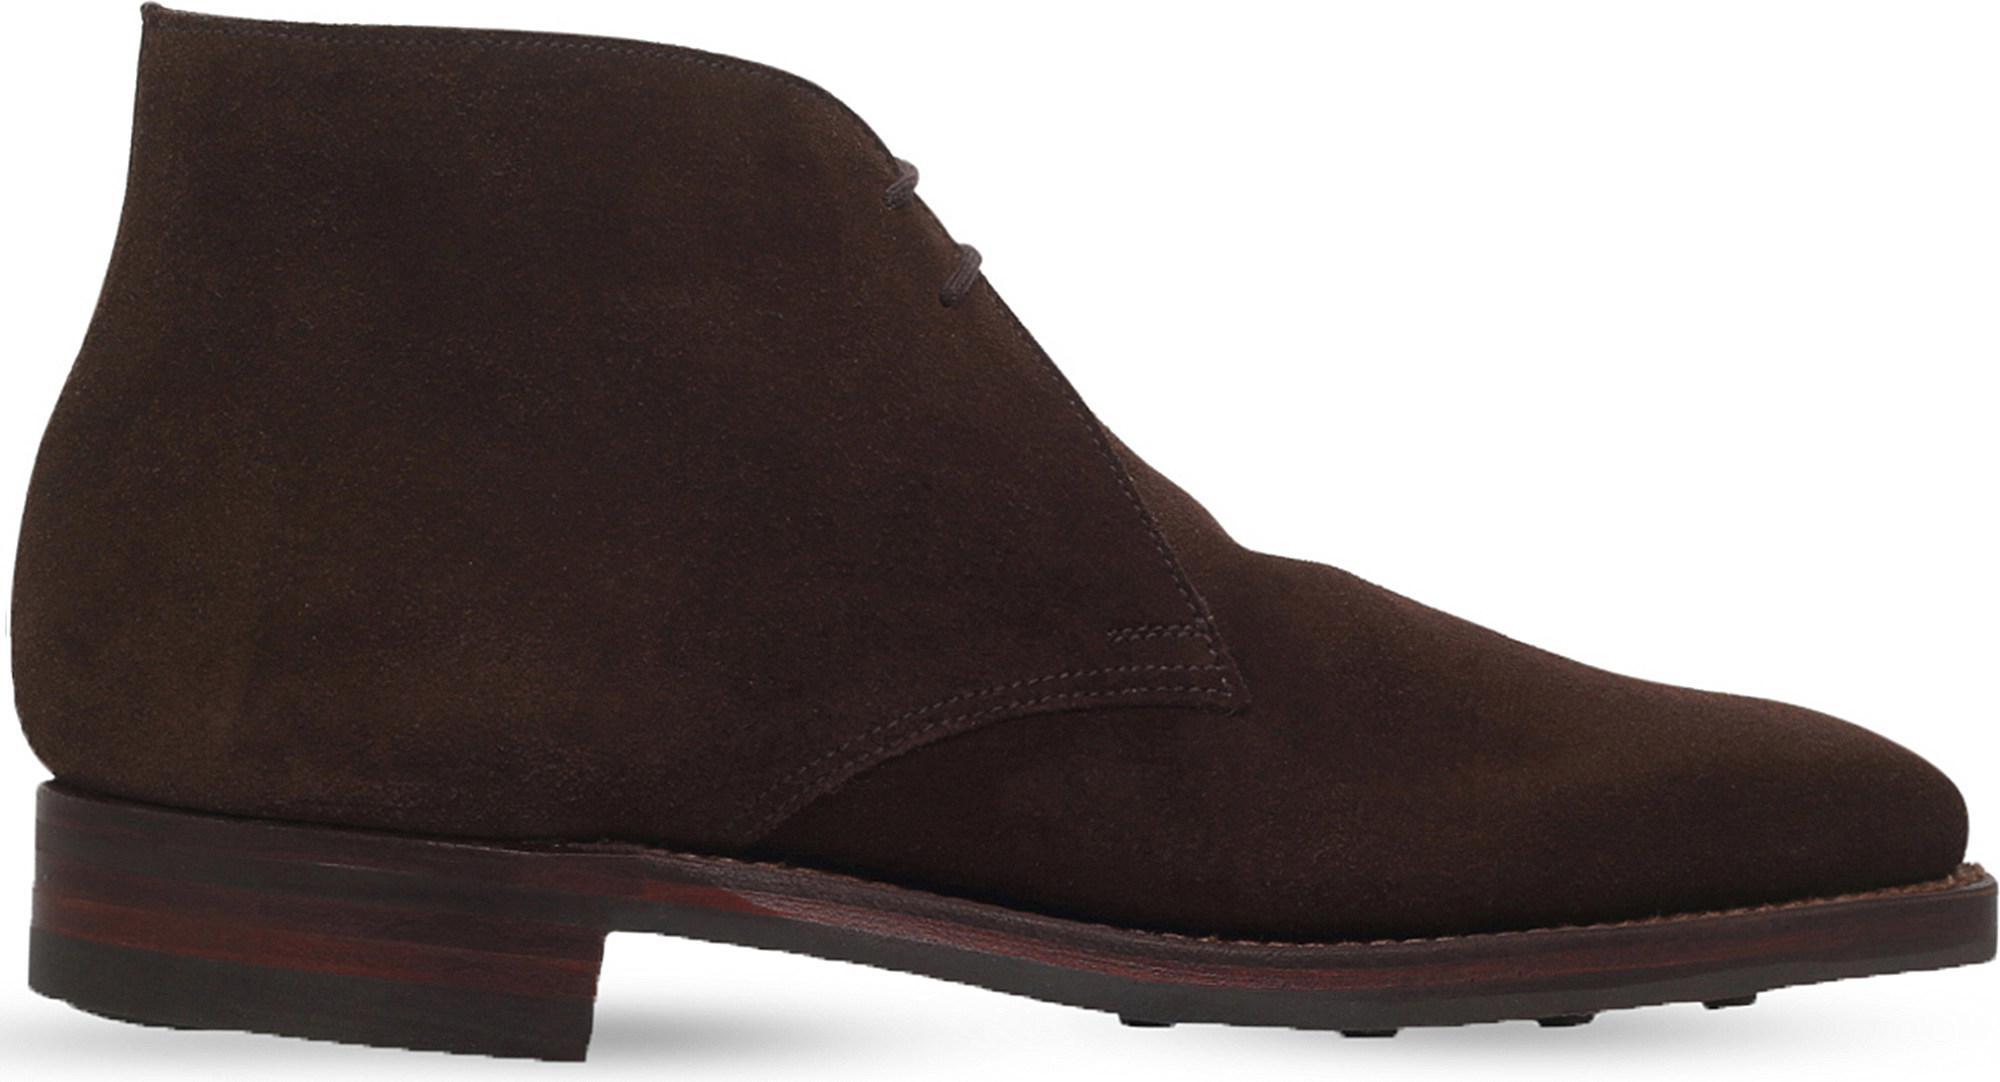 Crockett and Jones  Mens Dark Brown Tetbury Chukka Desert Bootss